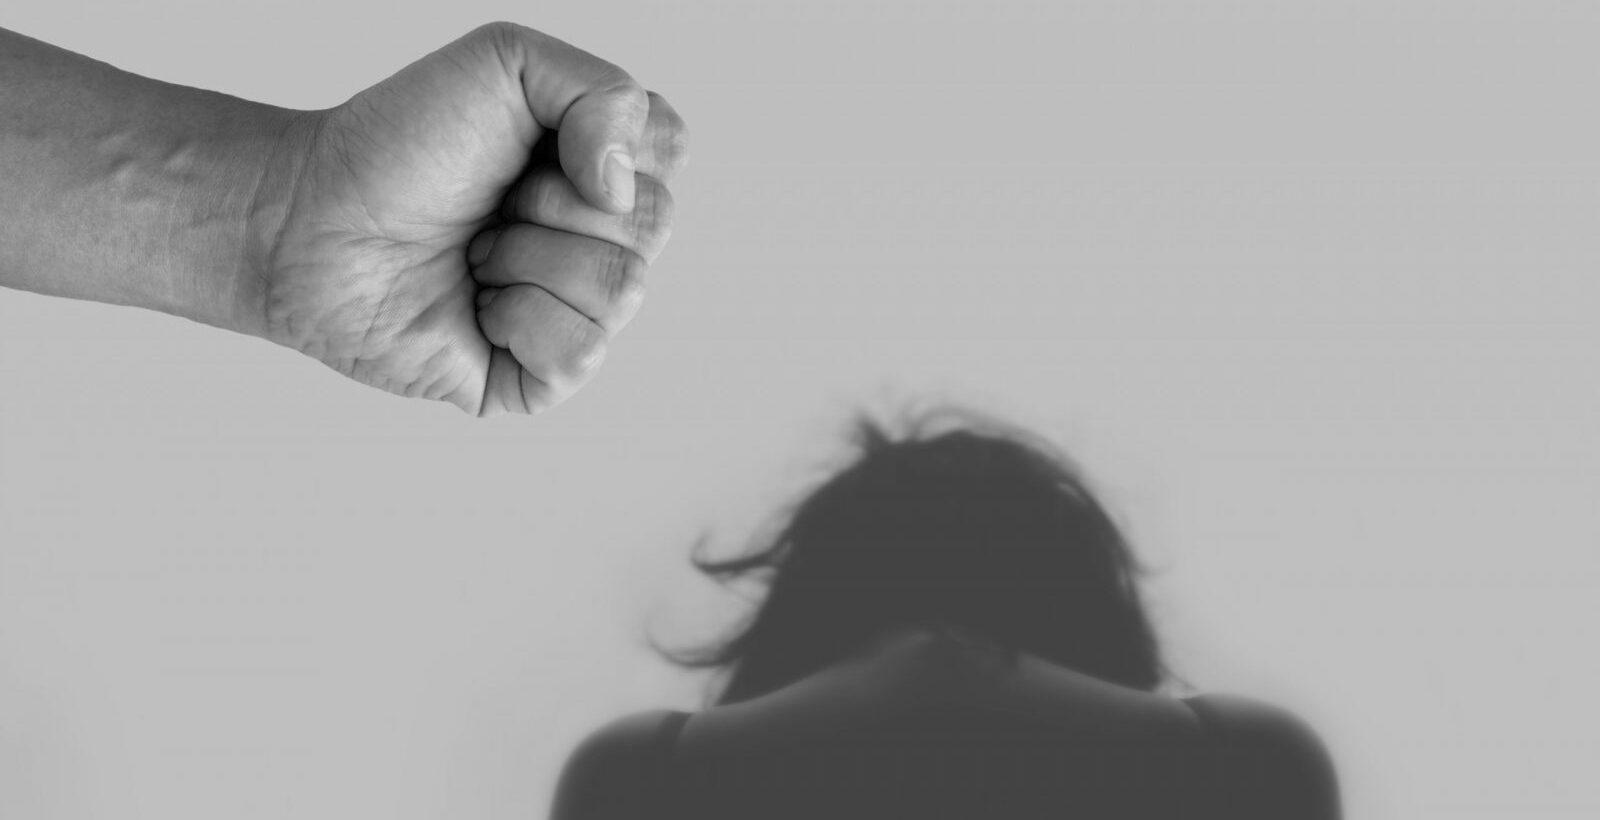 Agressie- en geweldtraining